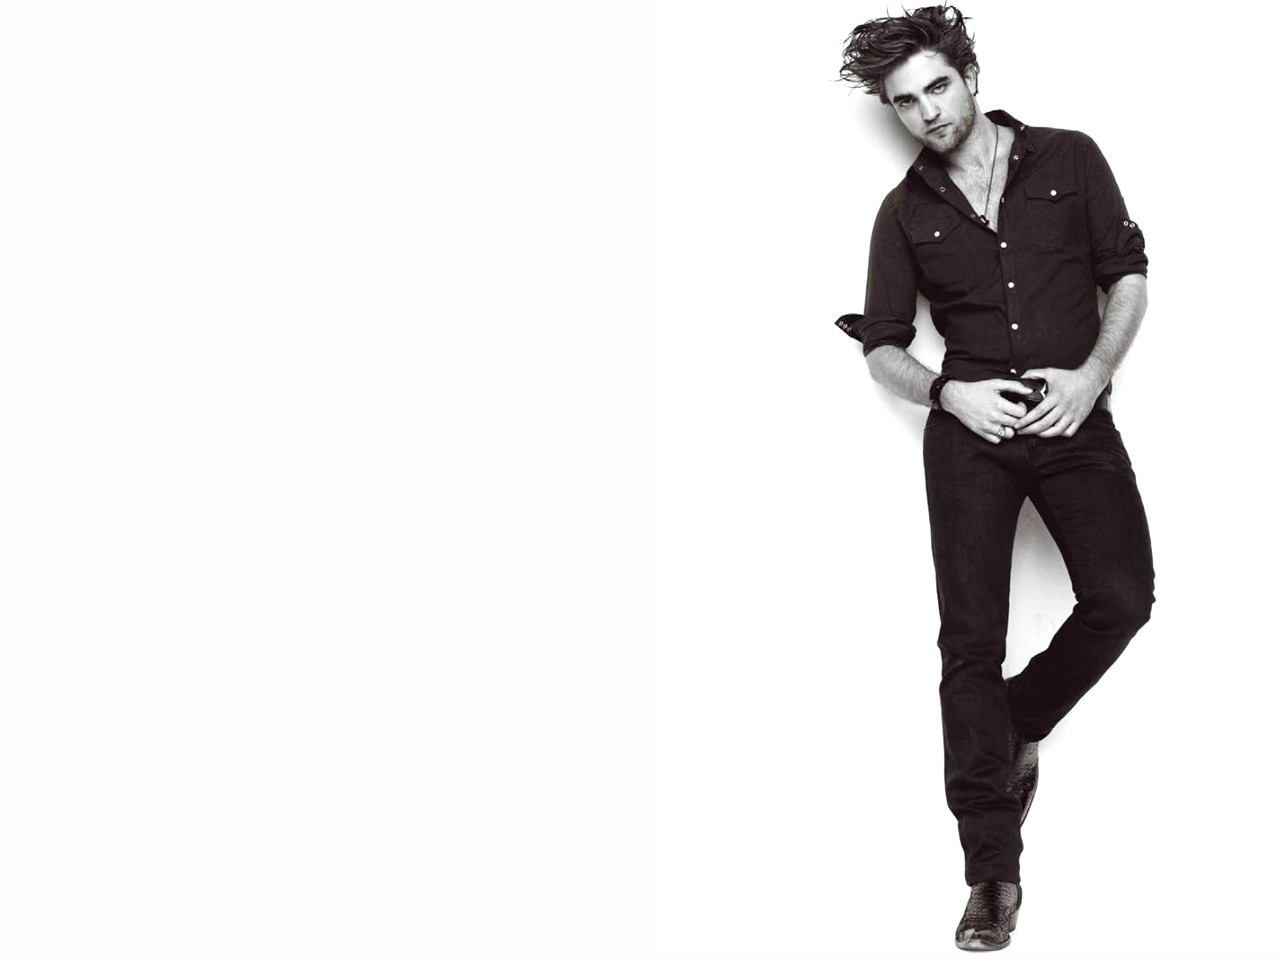 Un wallpaper di Robert Pattinson, la star di Twilight